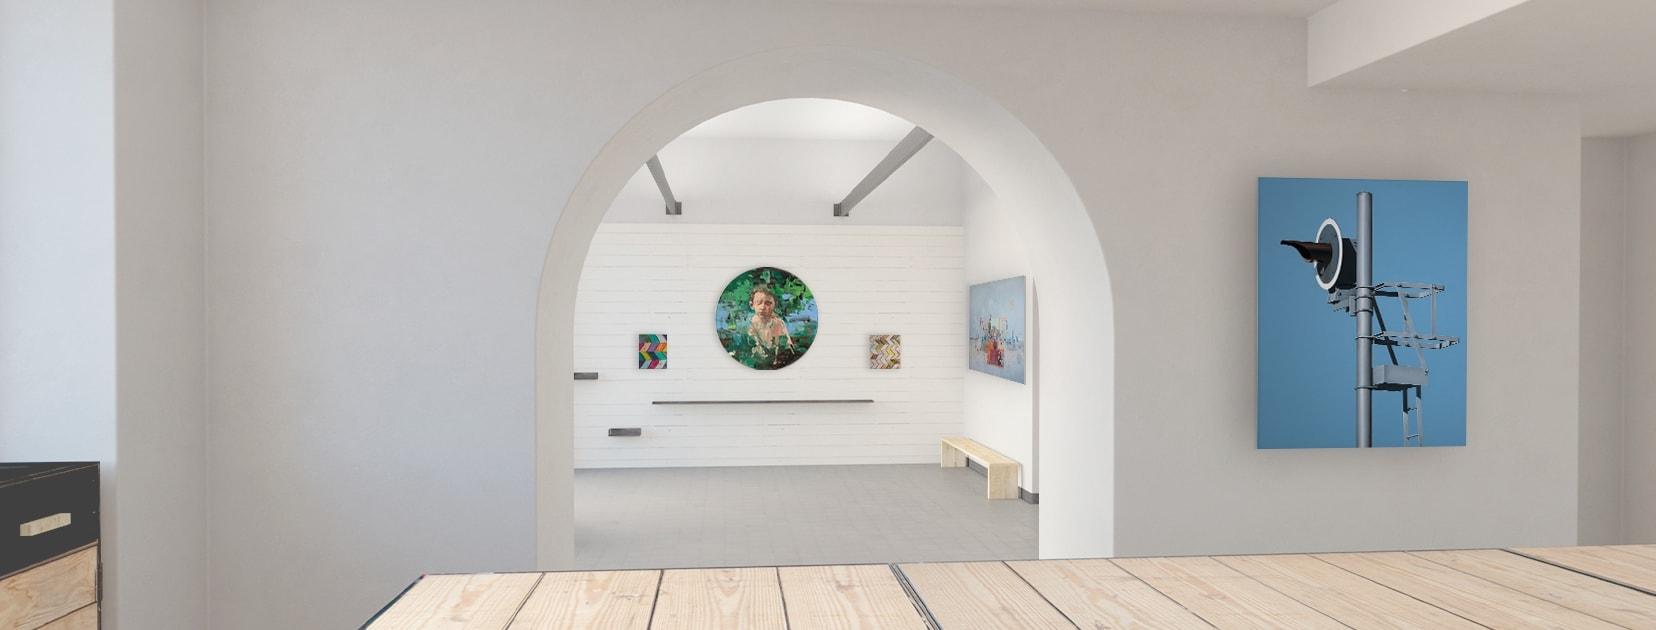 Slide galleria virtuale